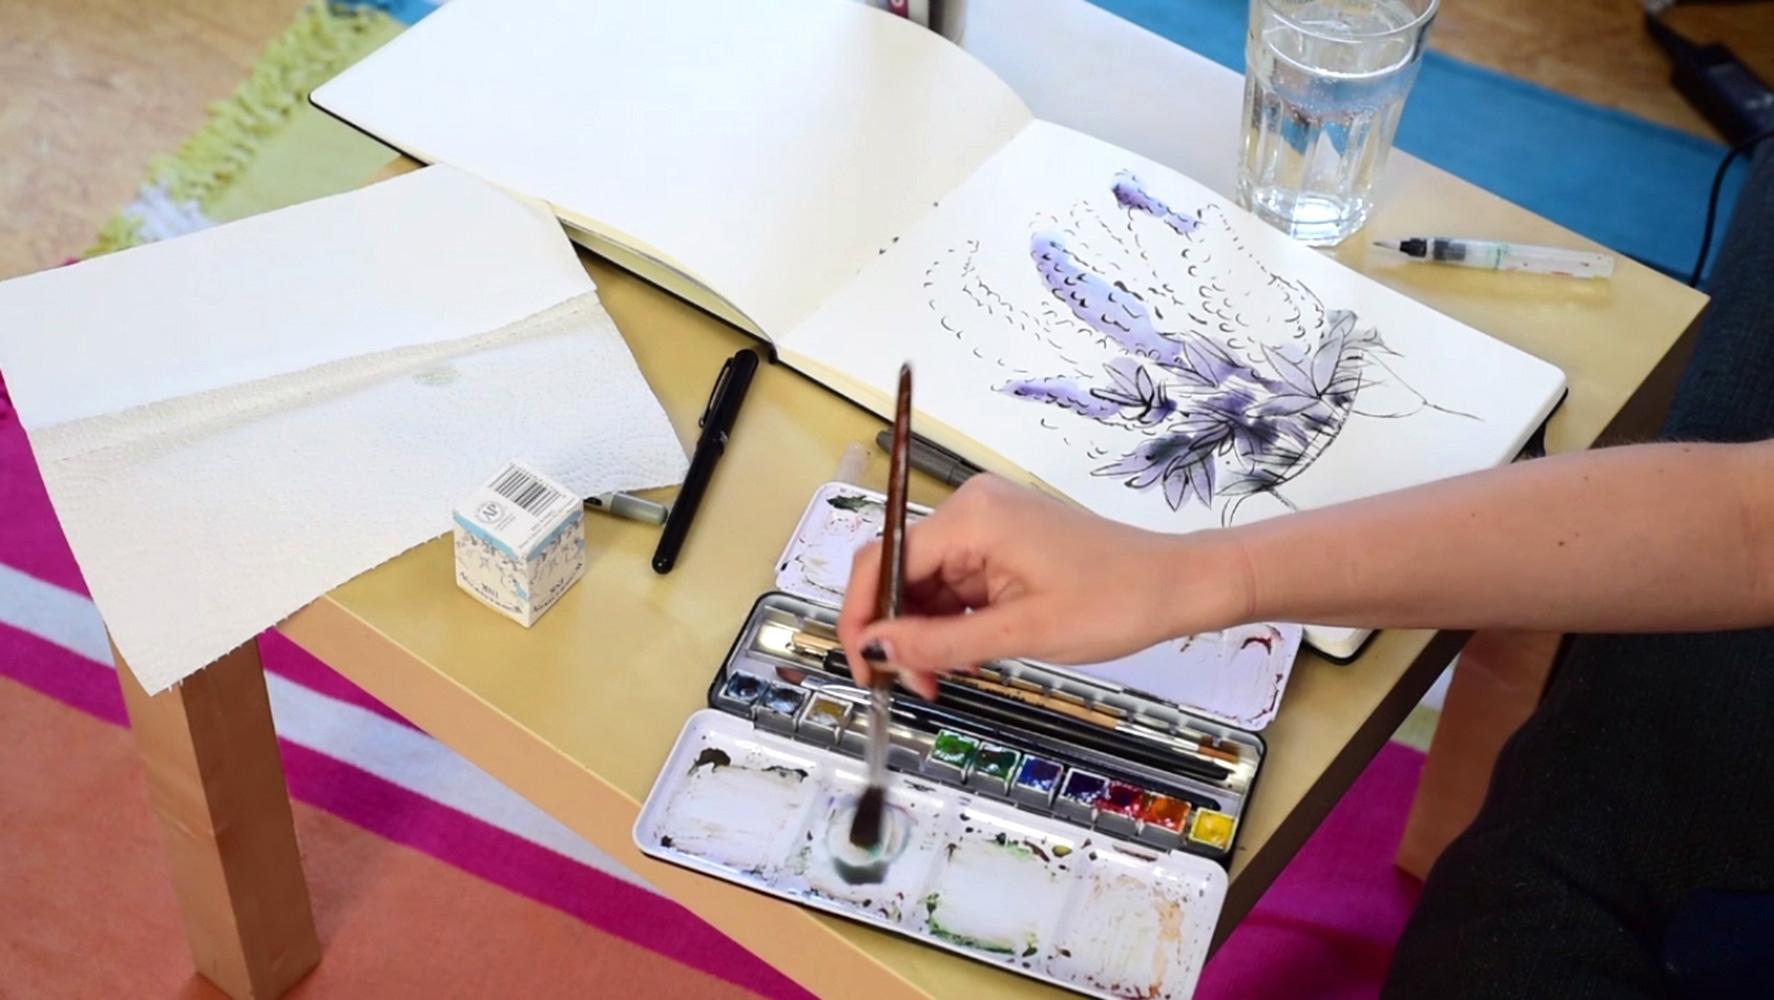 watercolor-lilacs-paintingprocess-stepbystep-franziskaschwade-2